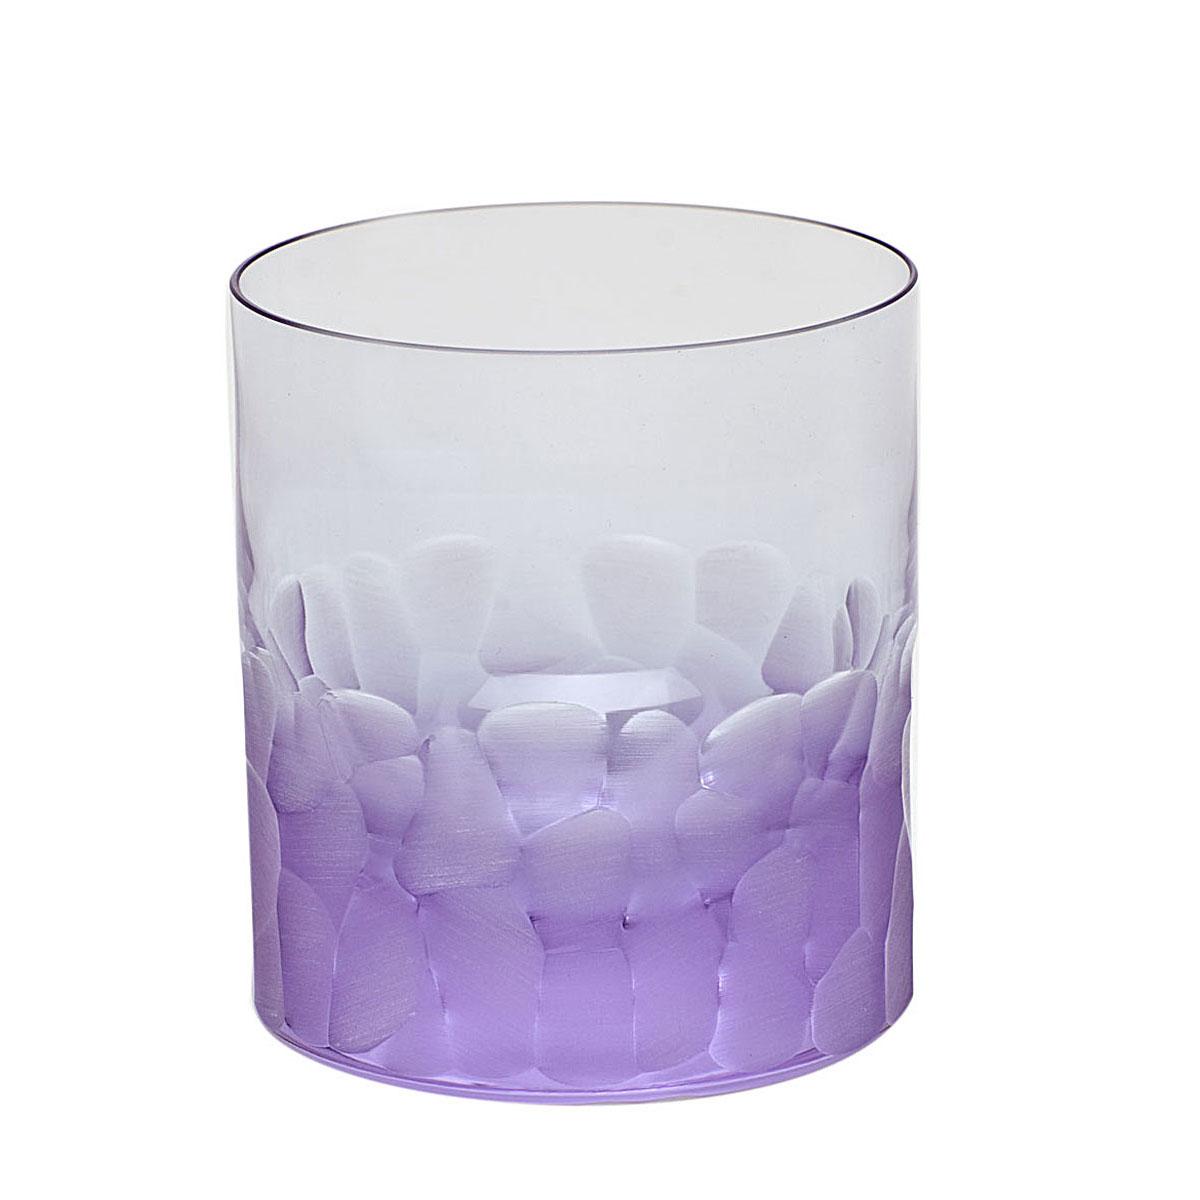 Moser Crystal Pebbles DOF Tumbler, Alexandrite Purple, Single